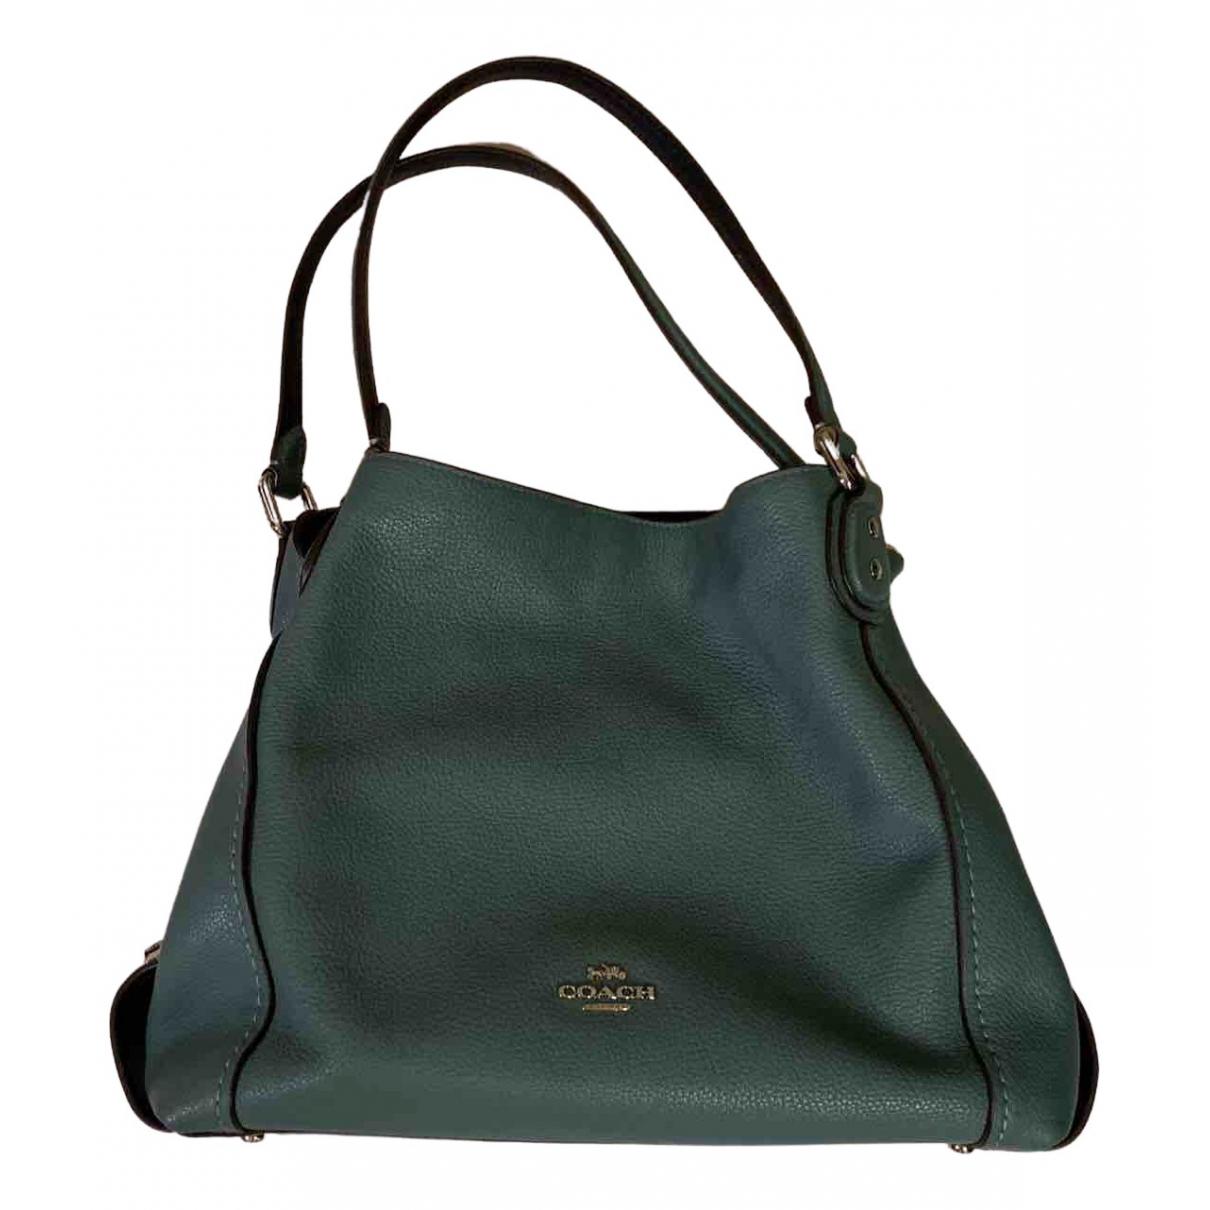 Coach N Green Leather handbag for Women N